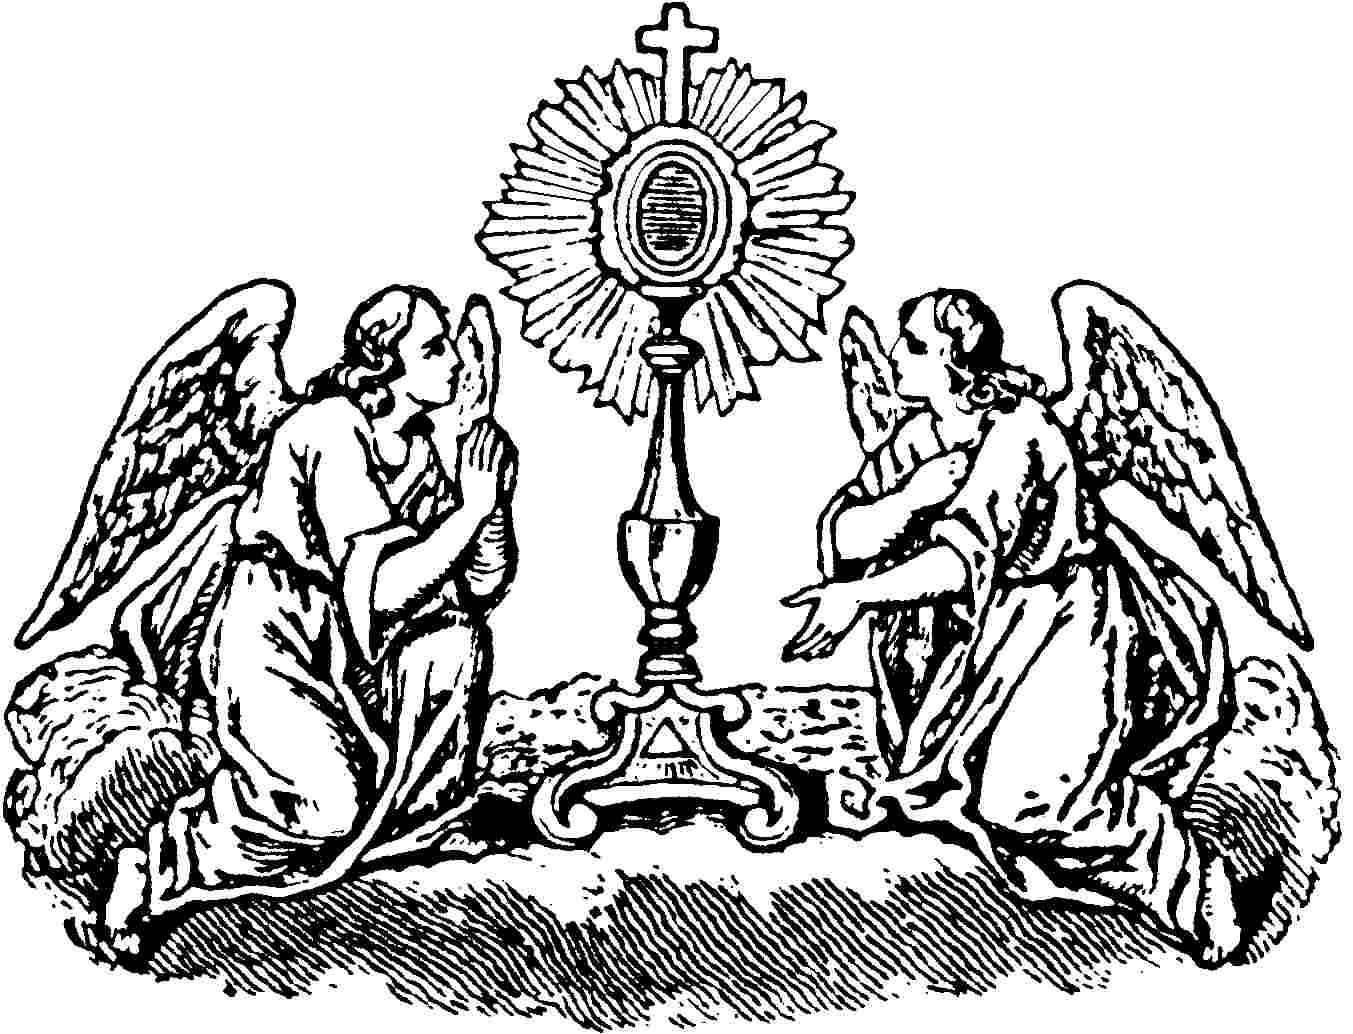 Lay Dominicans del Espiritu Santo: Corpus Christi